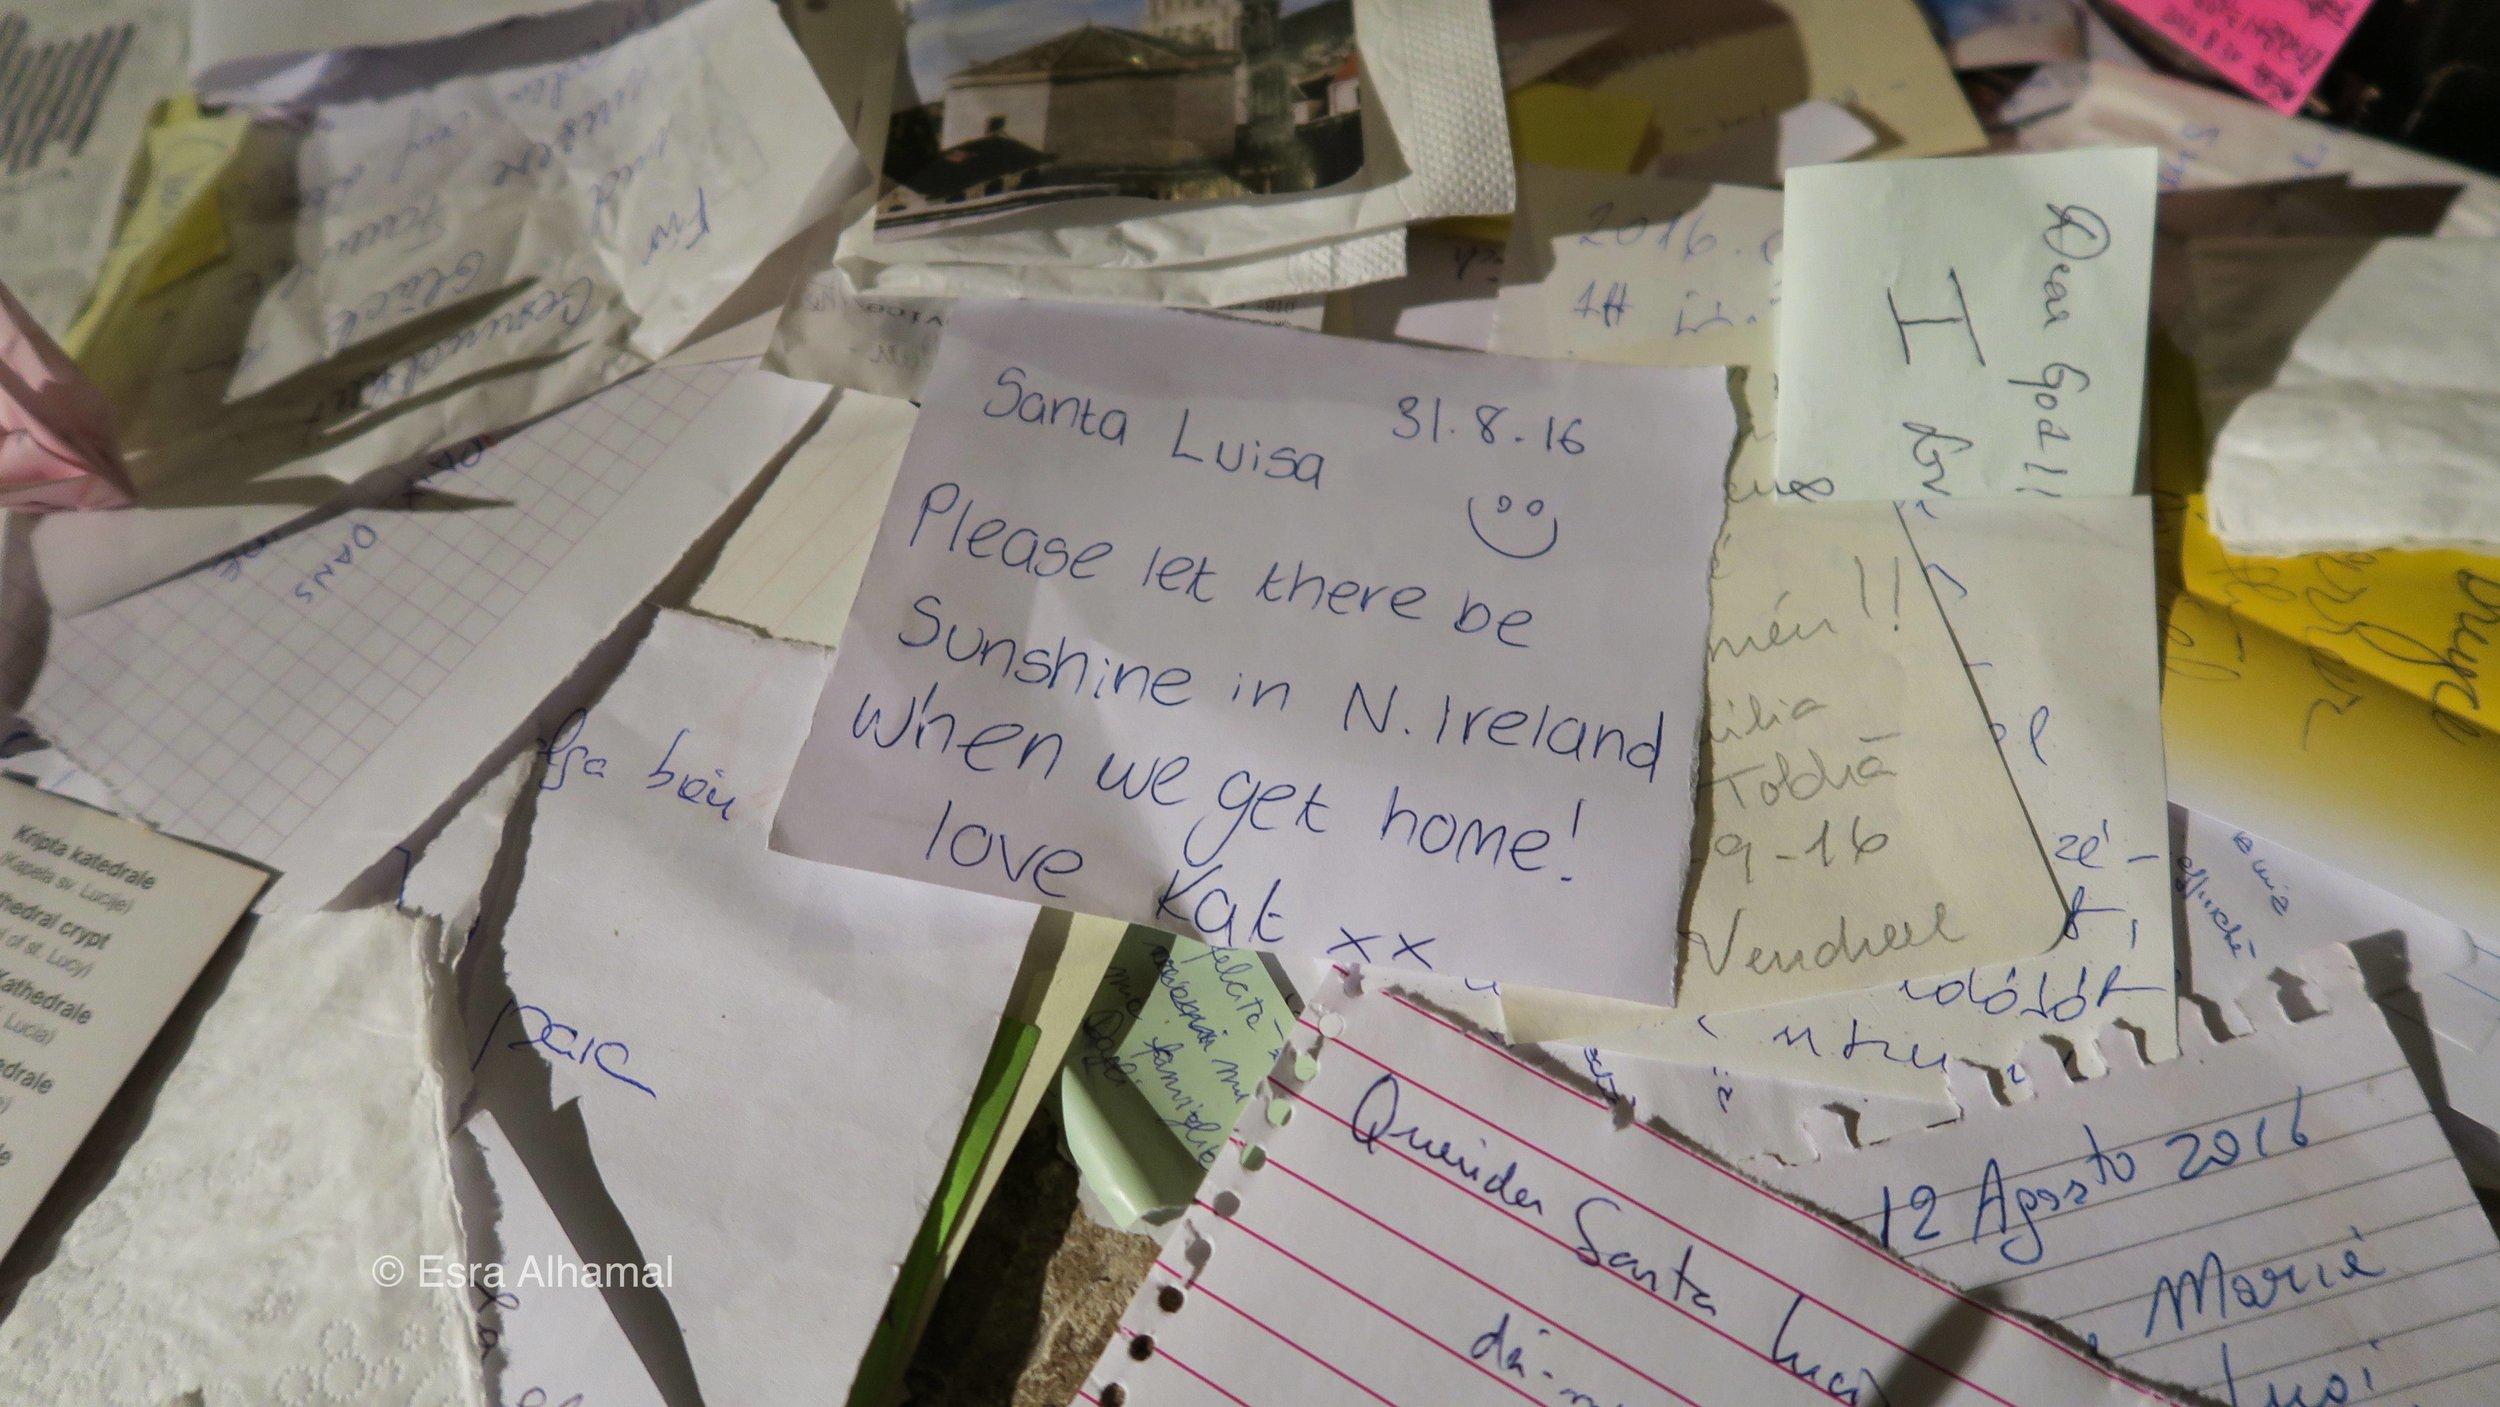 Notes left to Santa Luisa